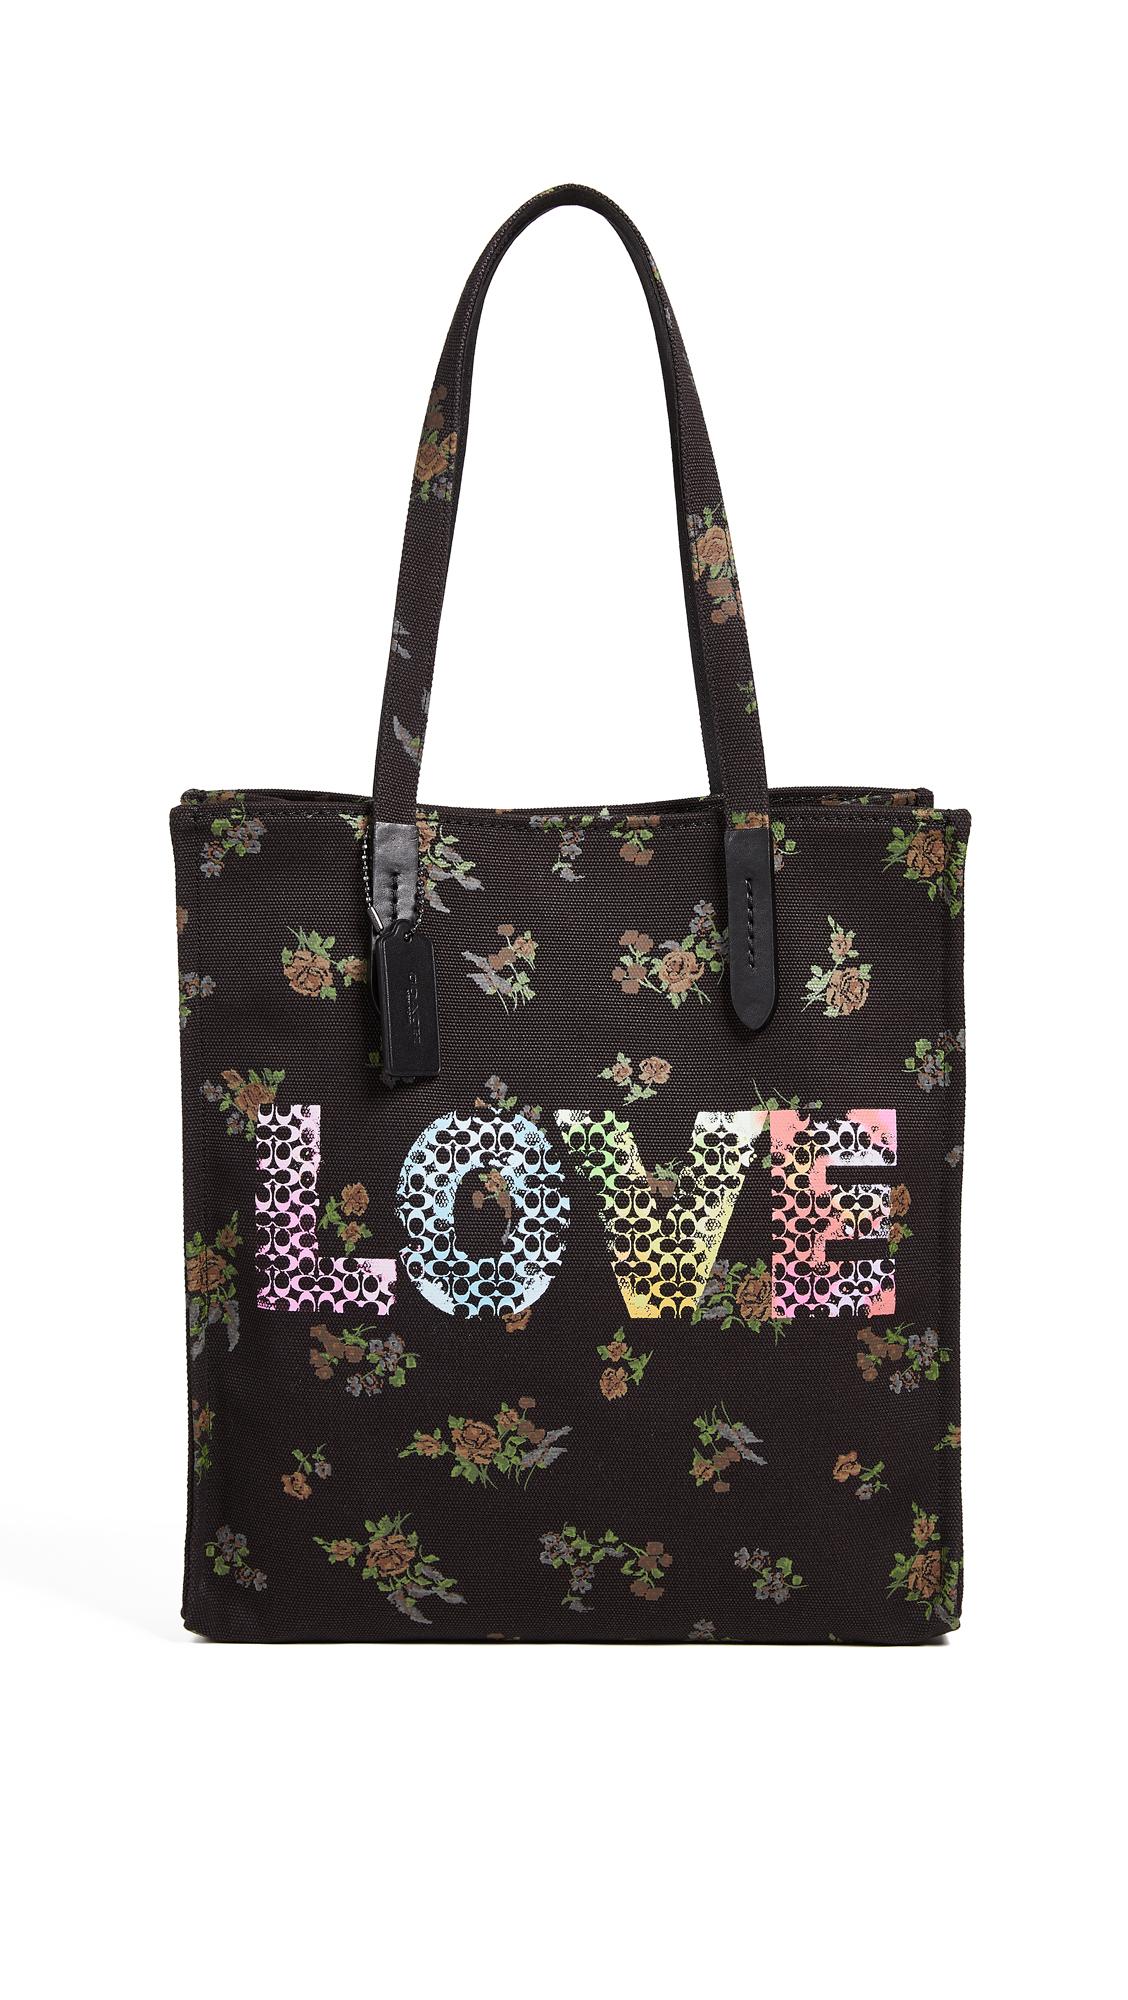 60425315623bf Coach 1941 Signature LOVE Tote Bag | SHOPBOP